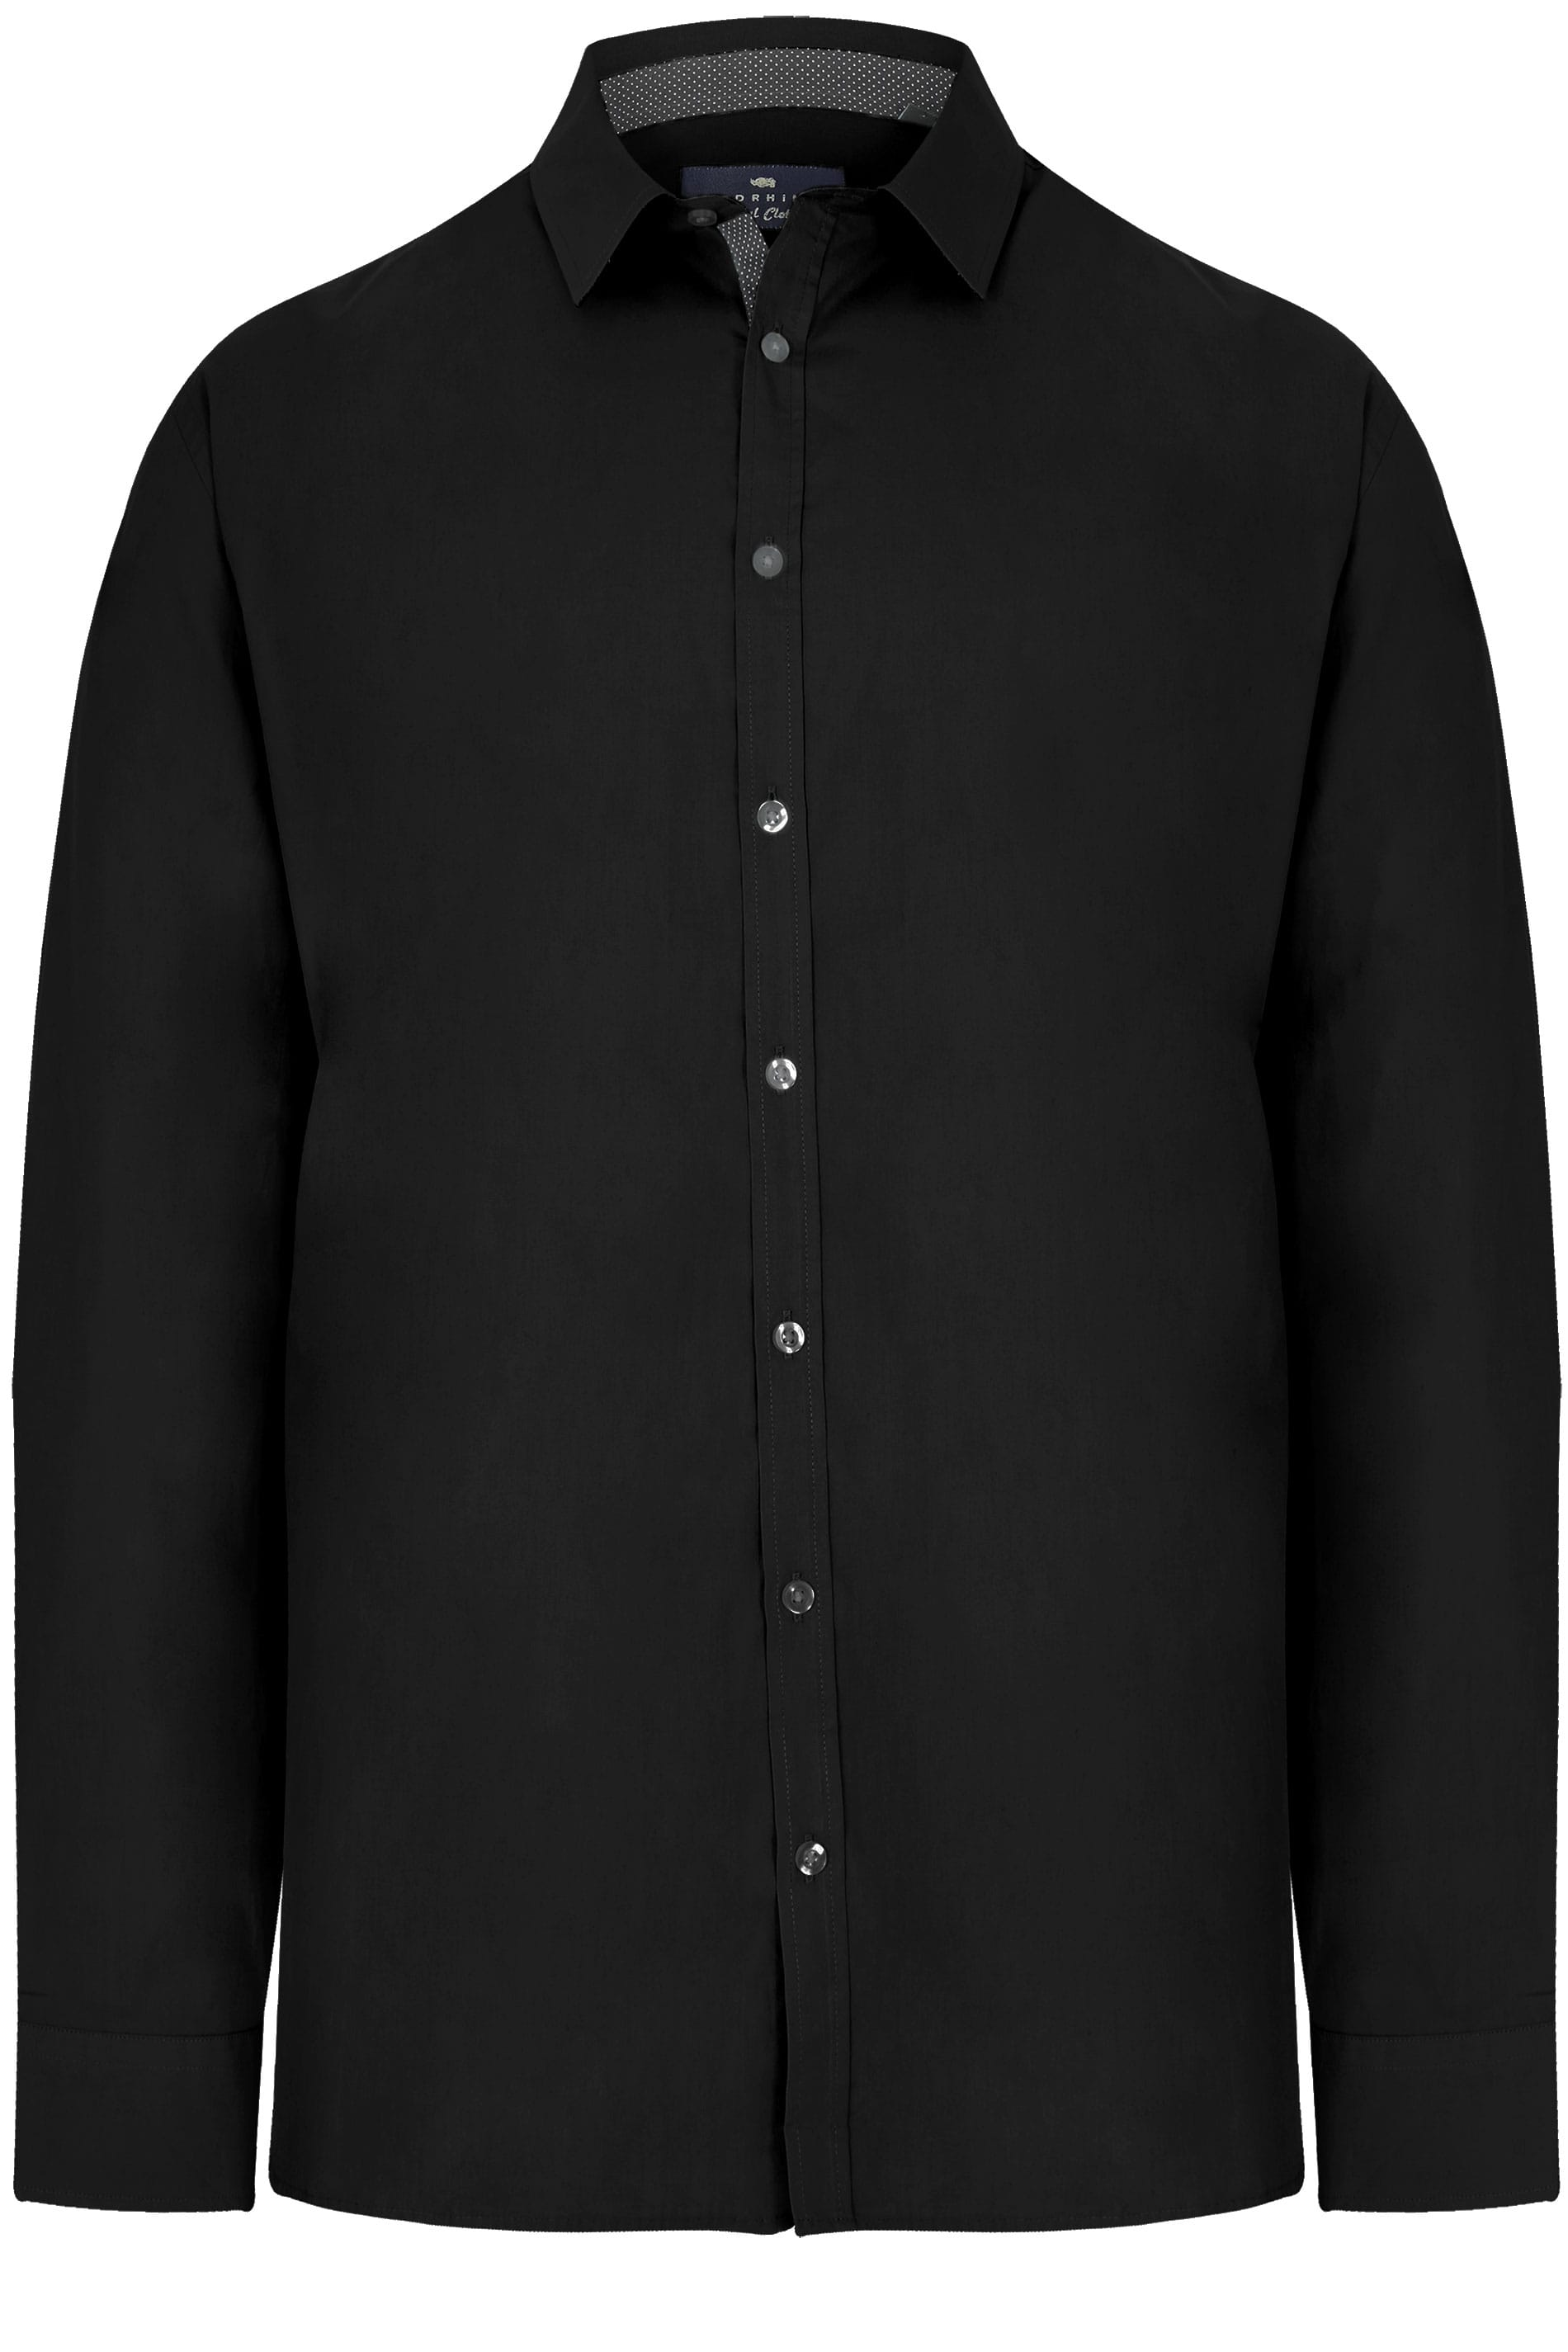 BadRhino Black Smart Patterned Trim Shirt